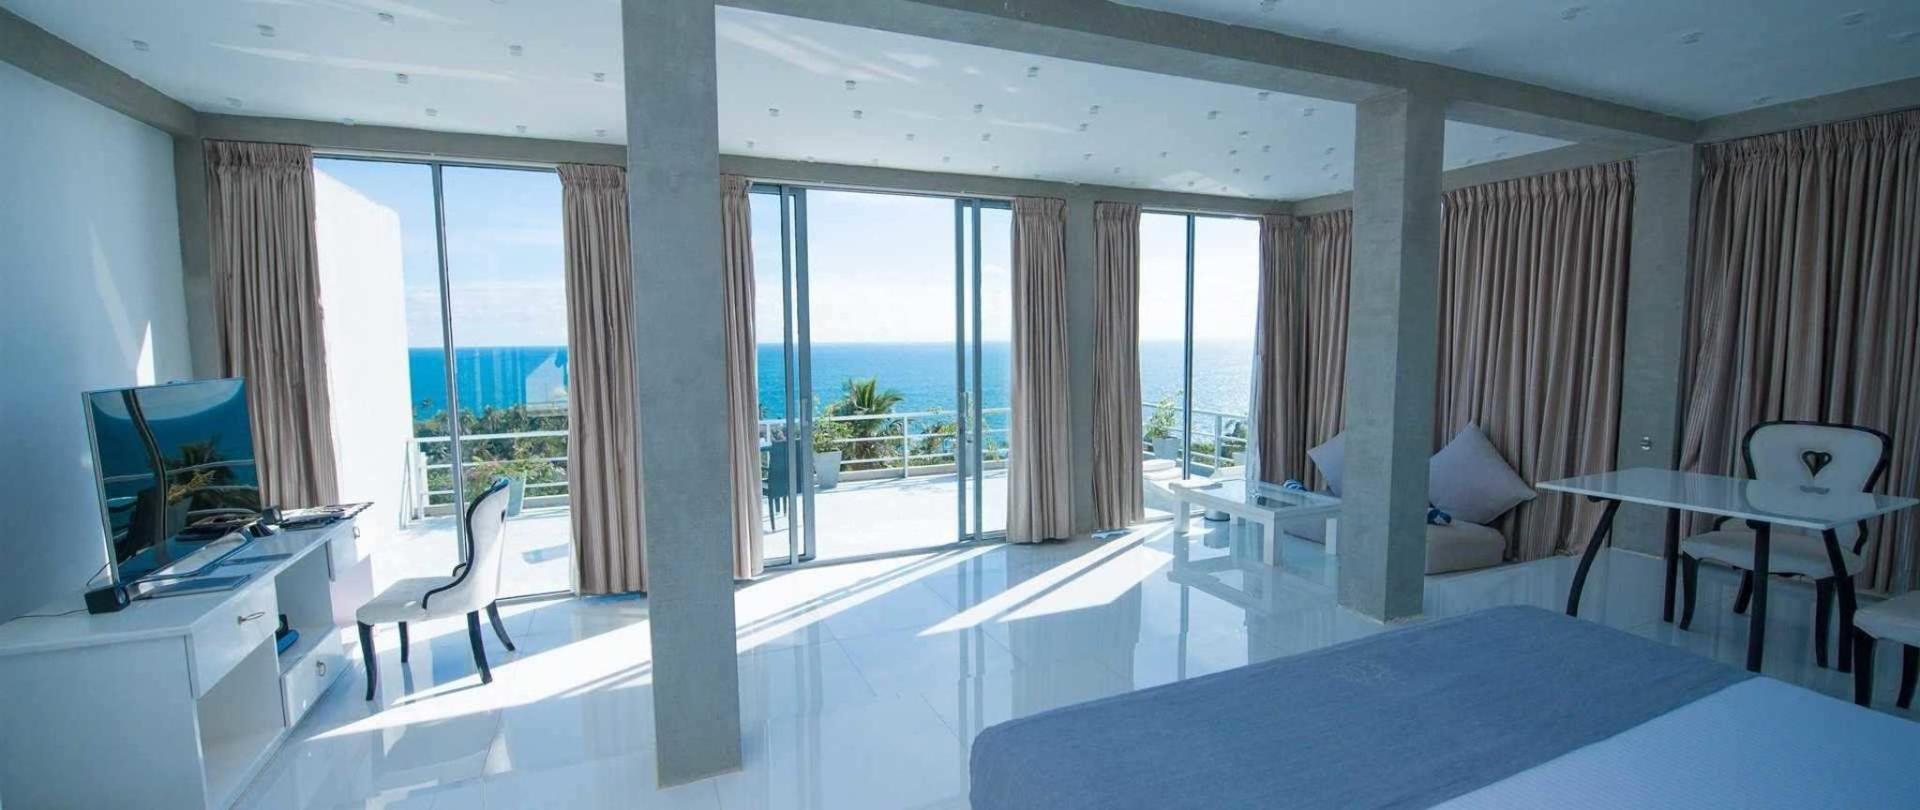 penthouse-4-jpg.jpeg